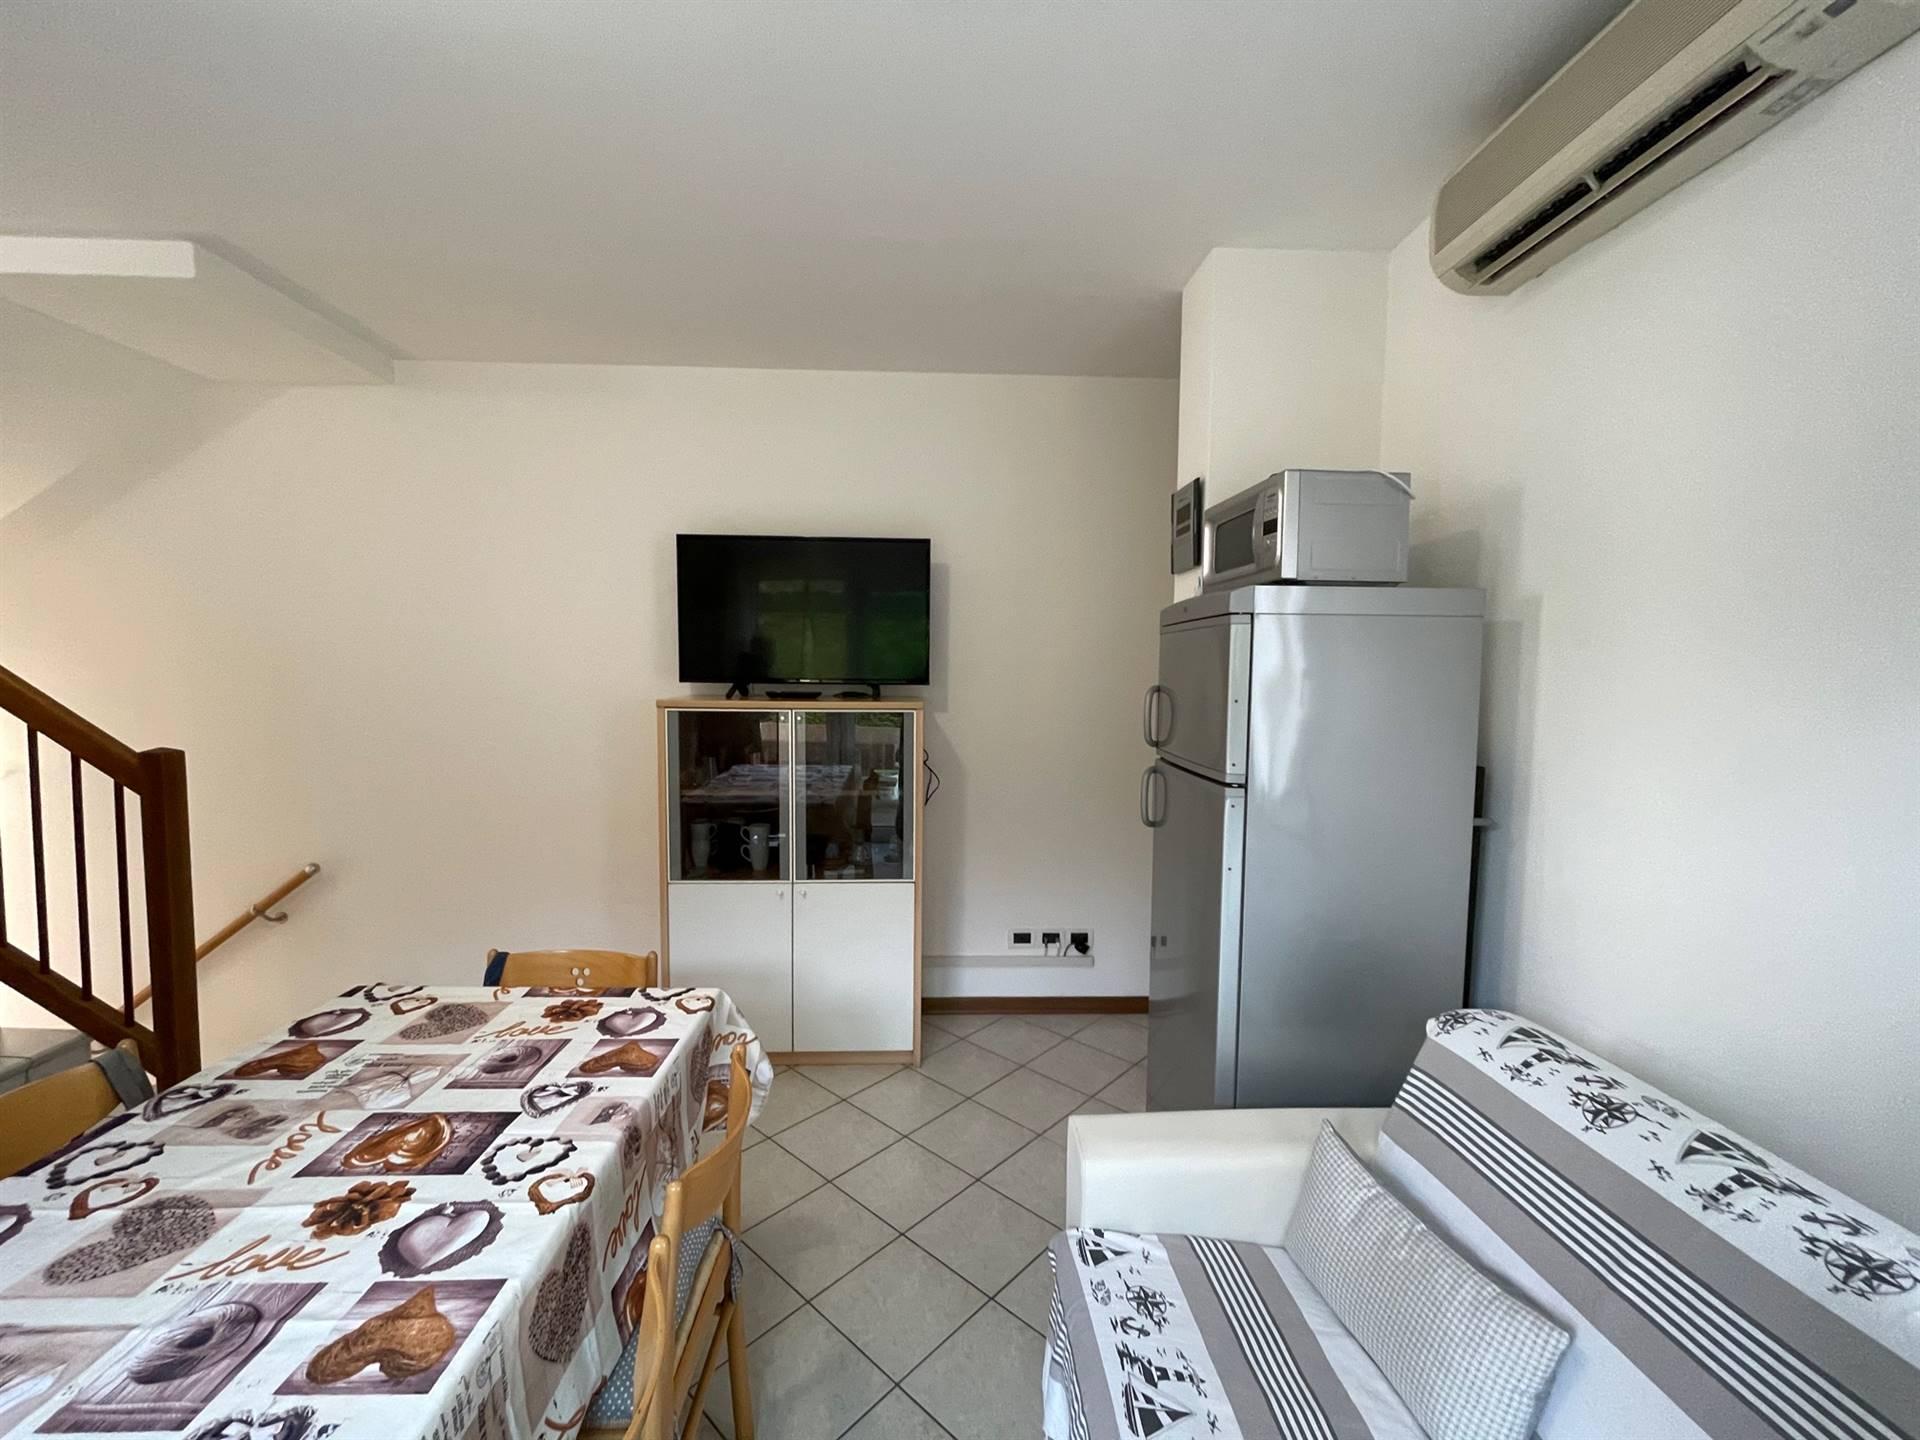 cucina arredata villetta indipendente Cavallino